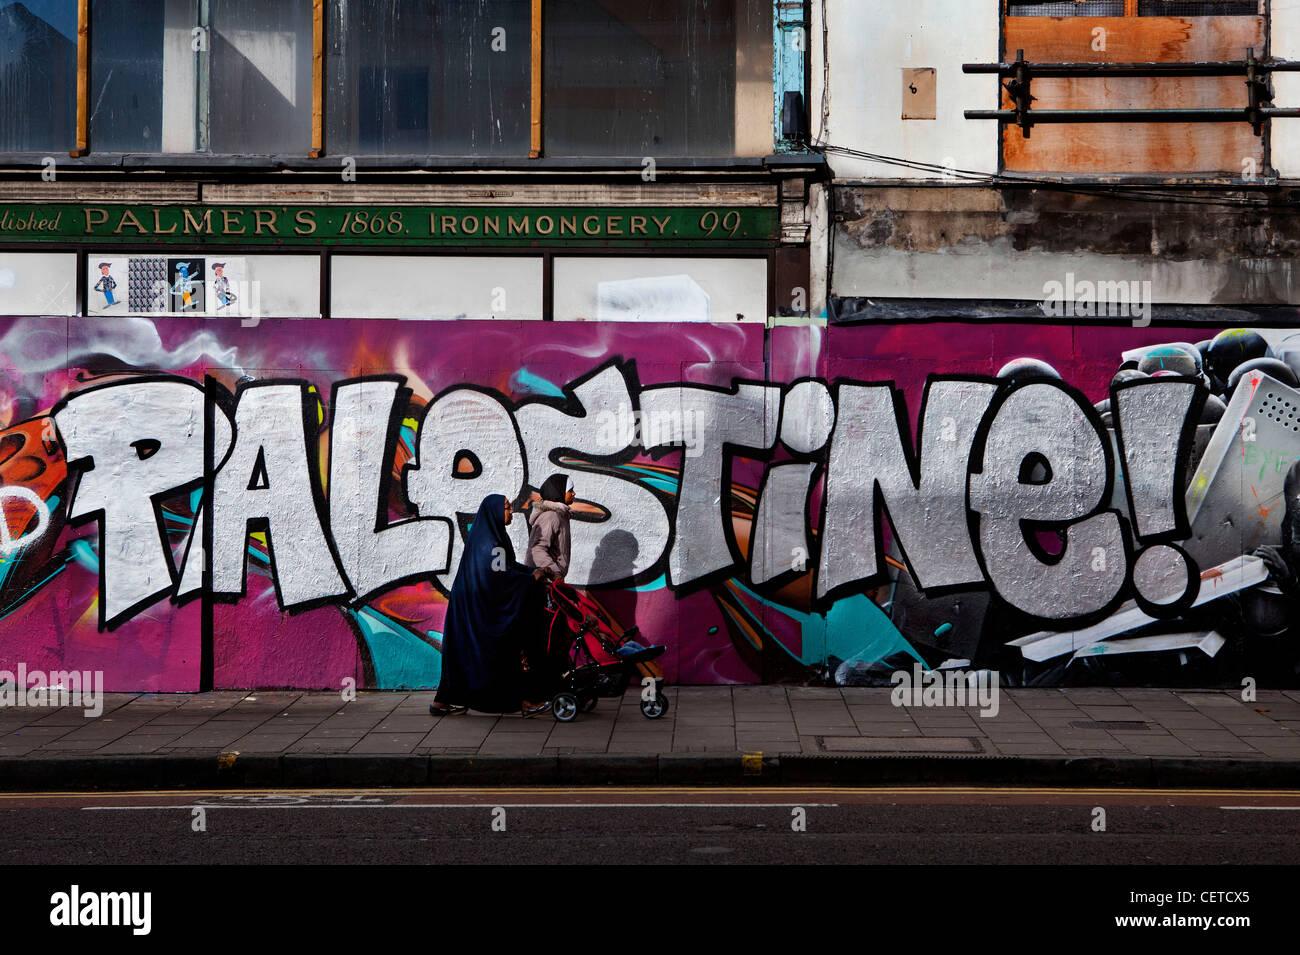 Graffiti supporting Palestine - Stock Image